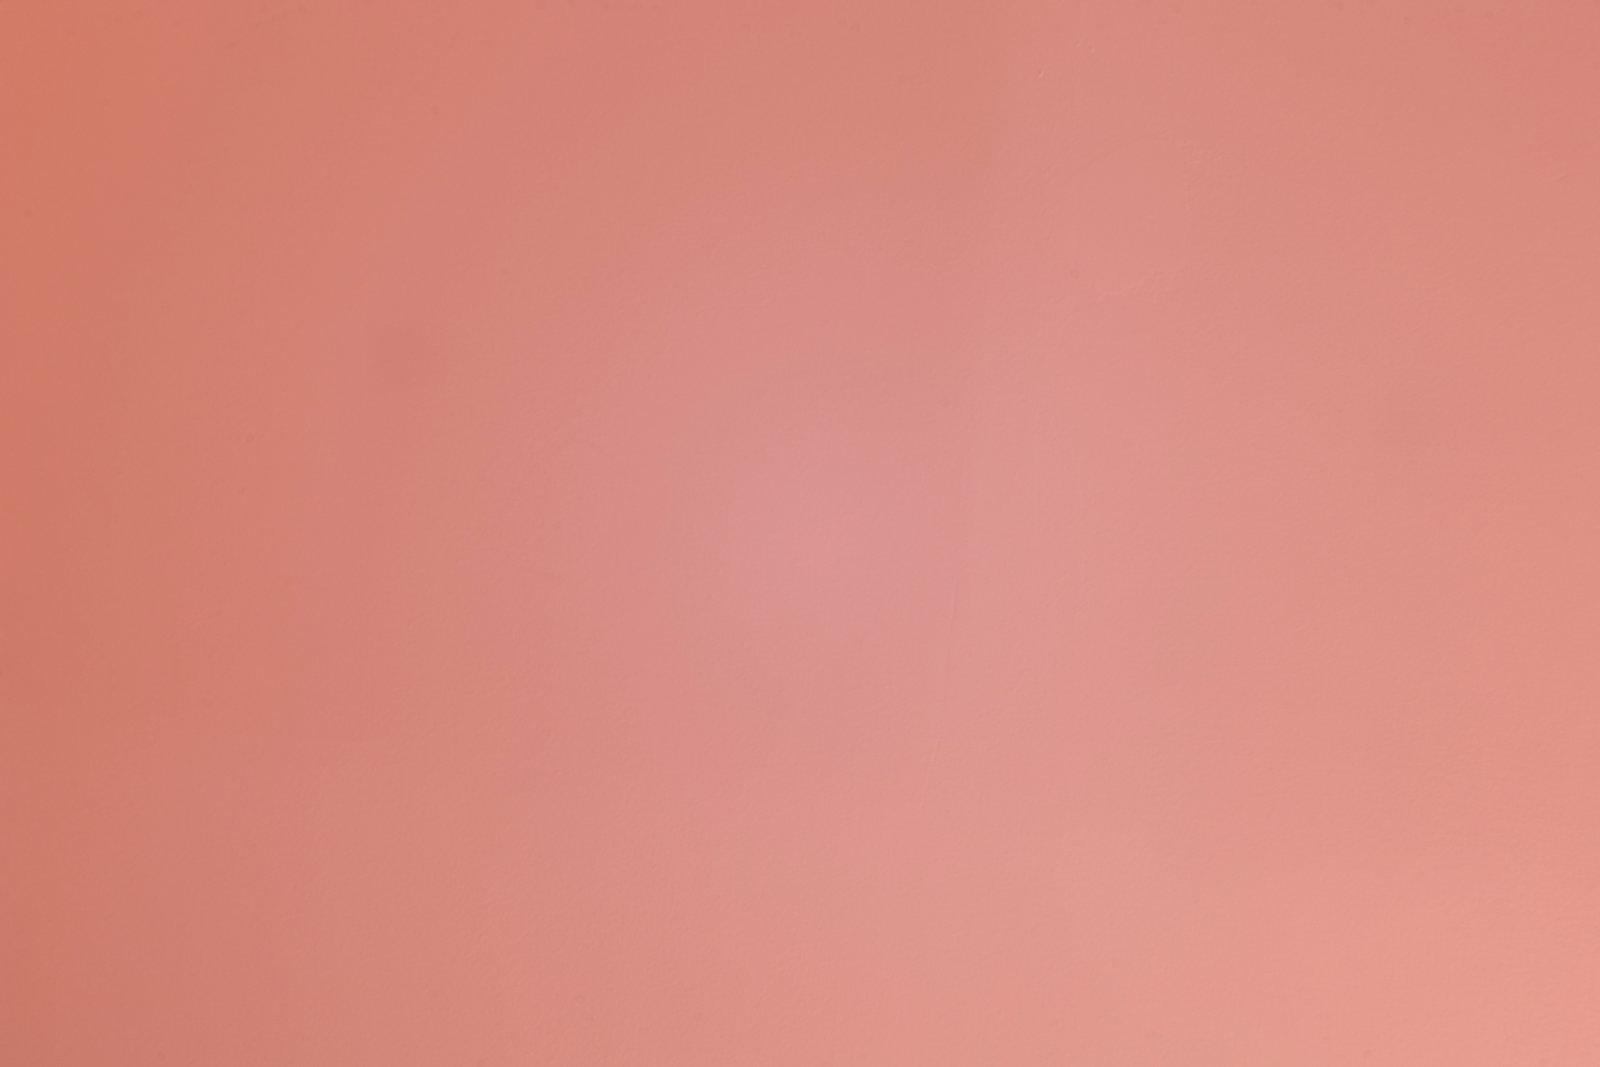 test infrarouge HOTSPOT 24mm F16 CANON | Pierre-Louis Ferrer | Test du SIGMA 24mm F/1.4 DG HSM Art en photographie infrarouge | Partie 1